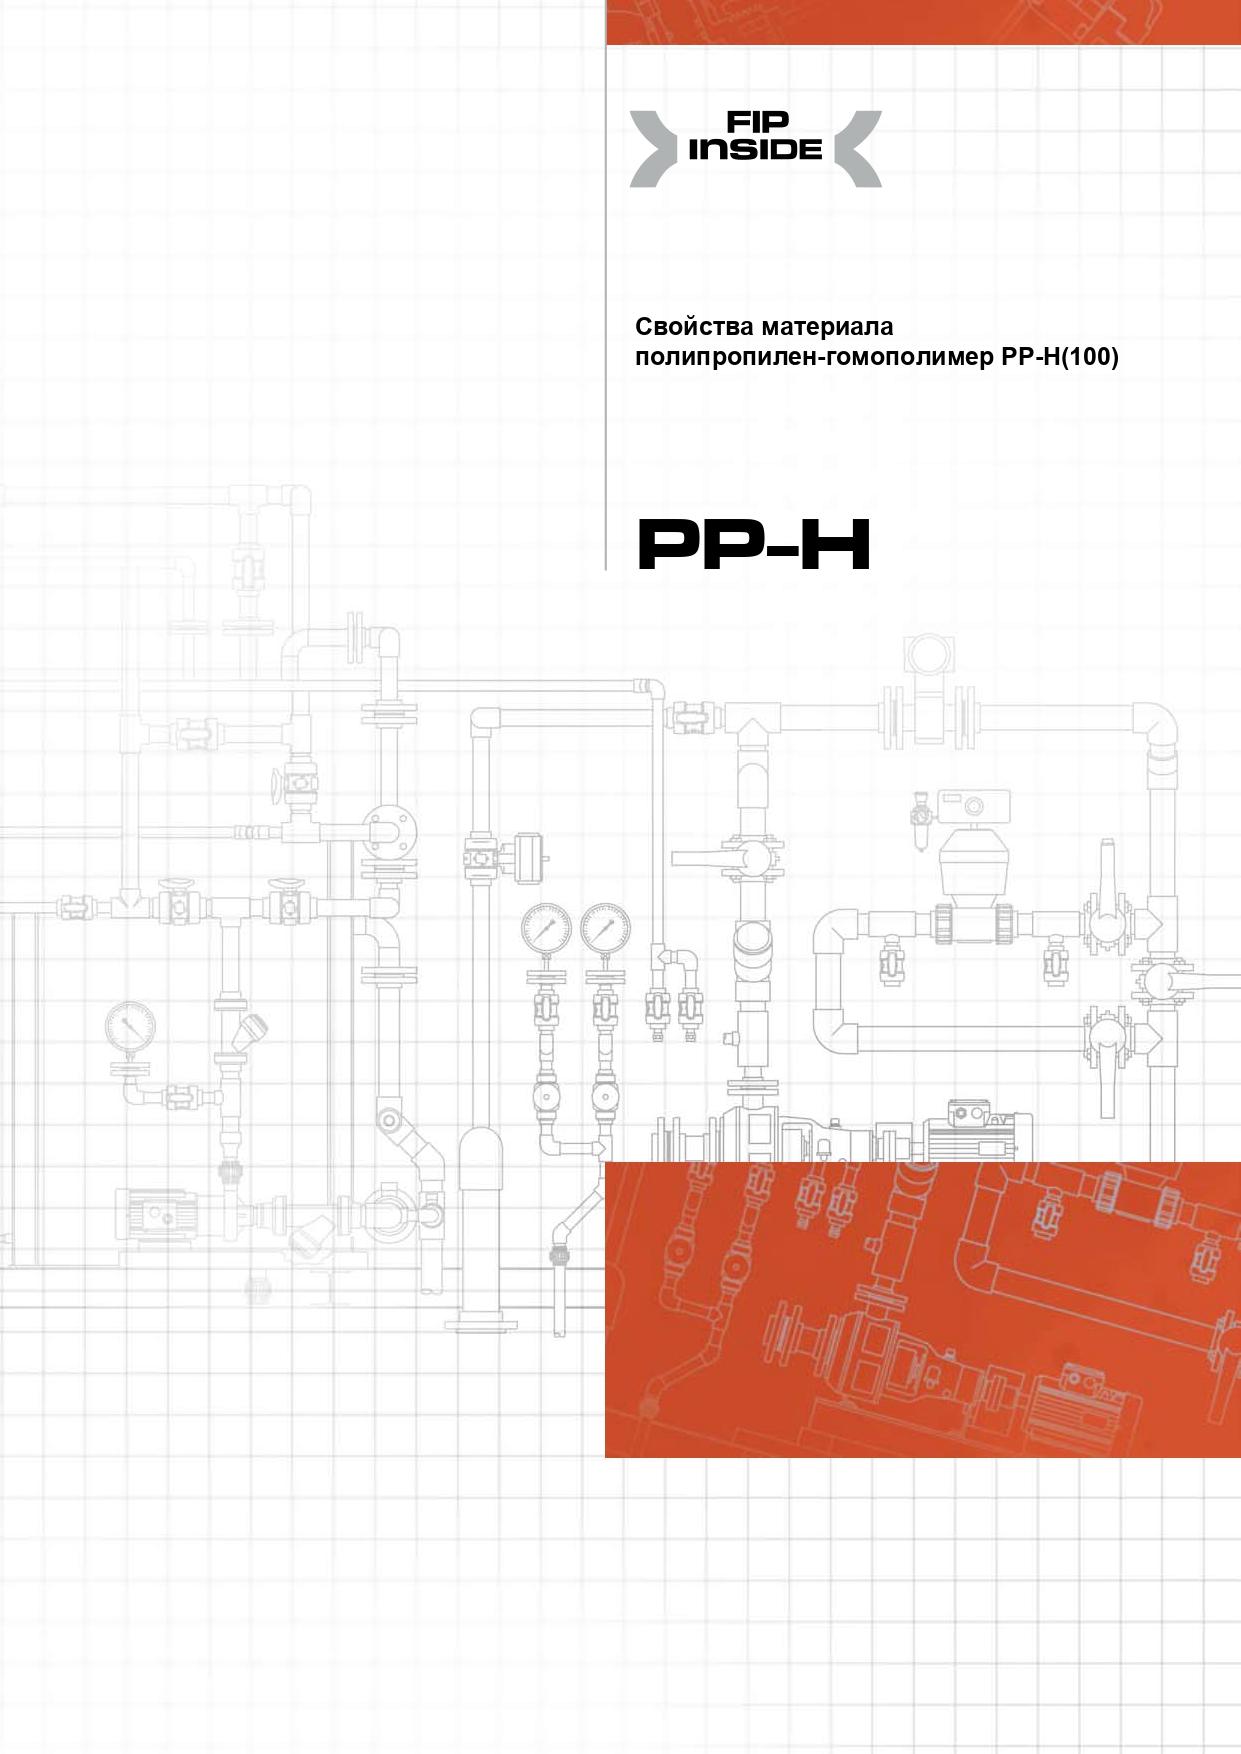 Общие характеристики ПП